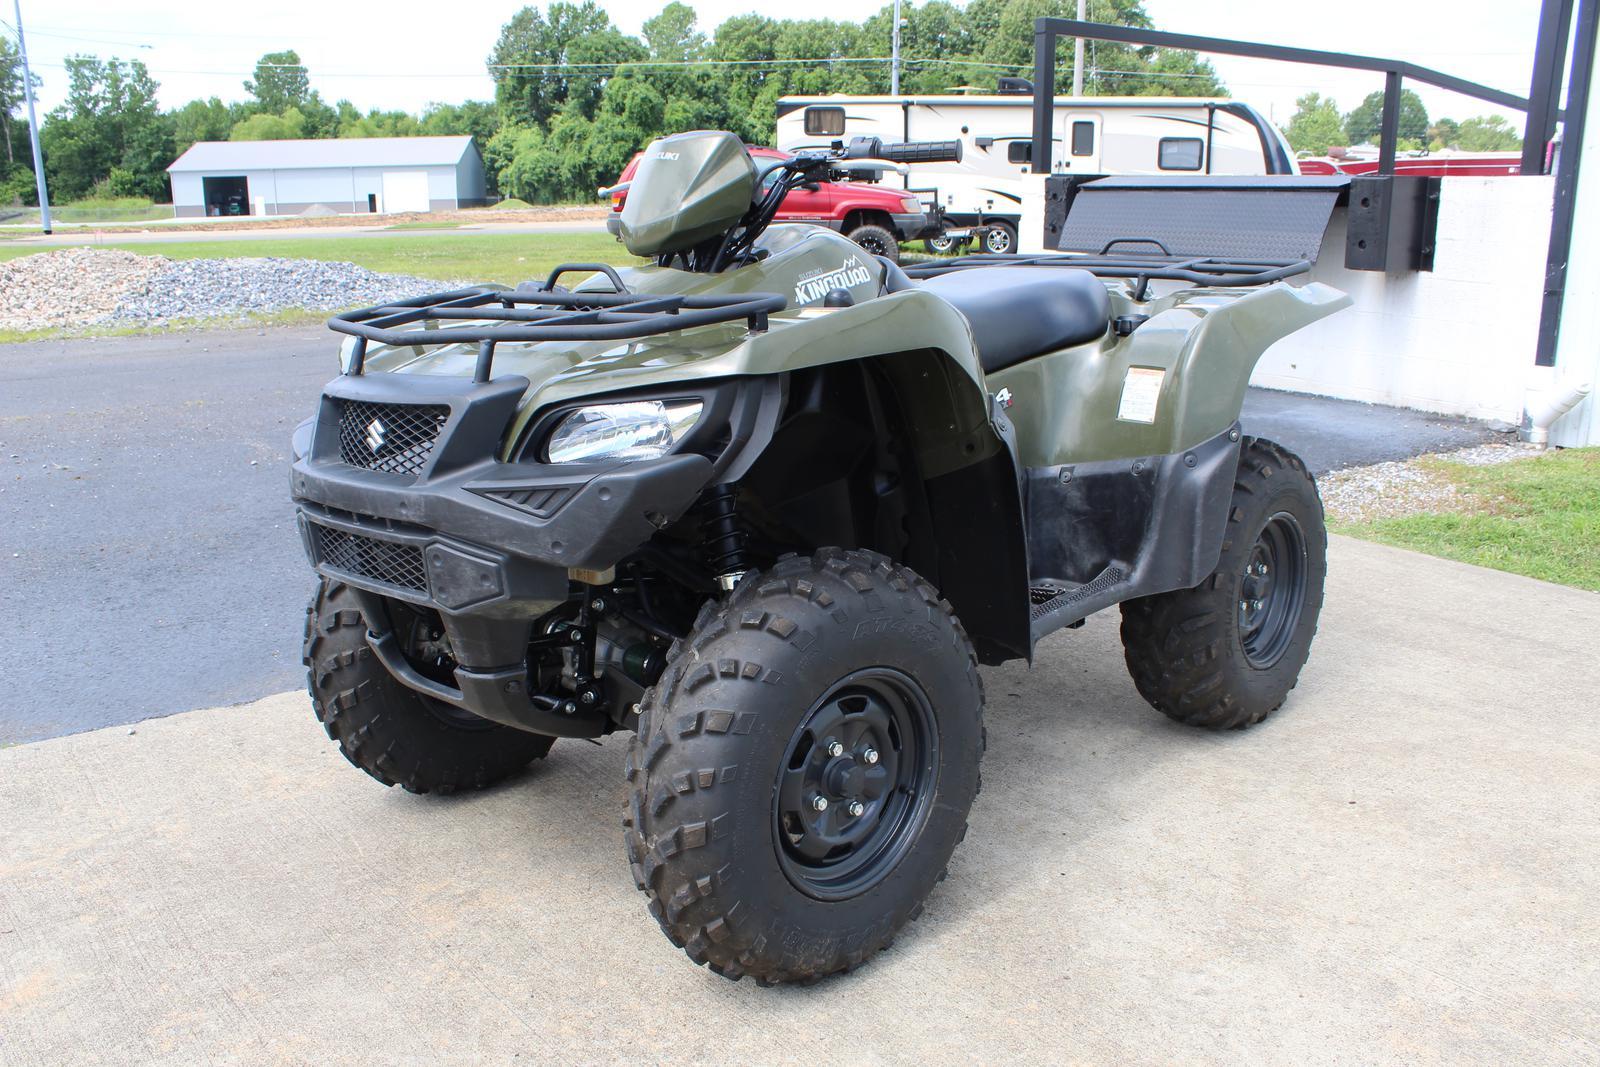 Inventory from Suzuki and TAOTAO Chase Motorsports Inc